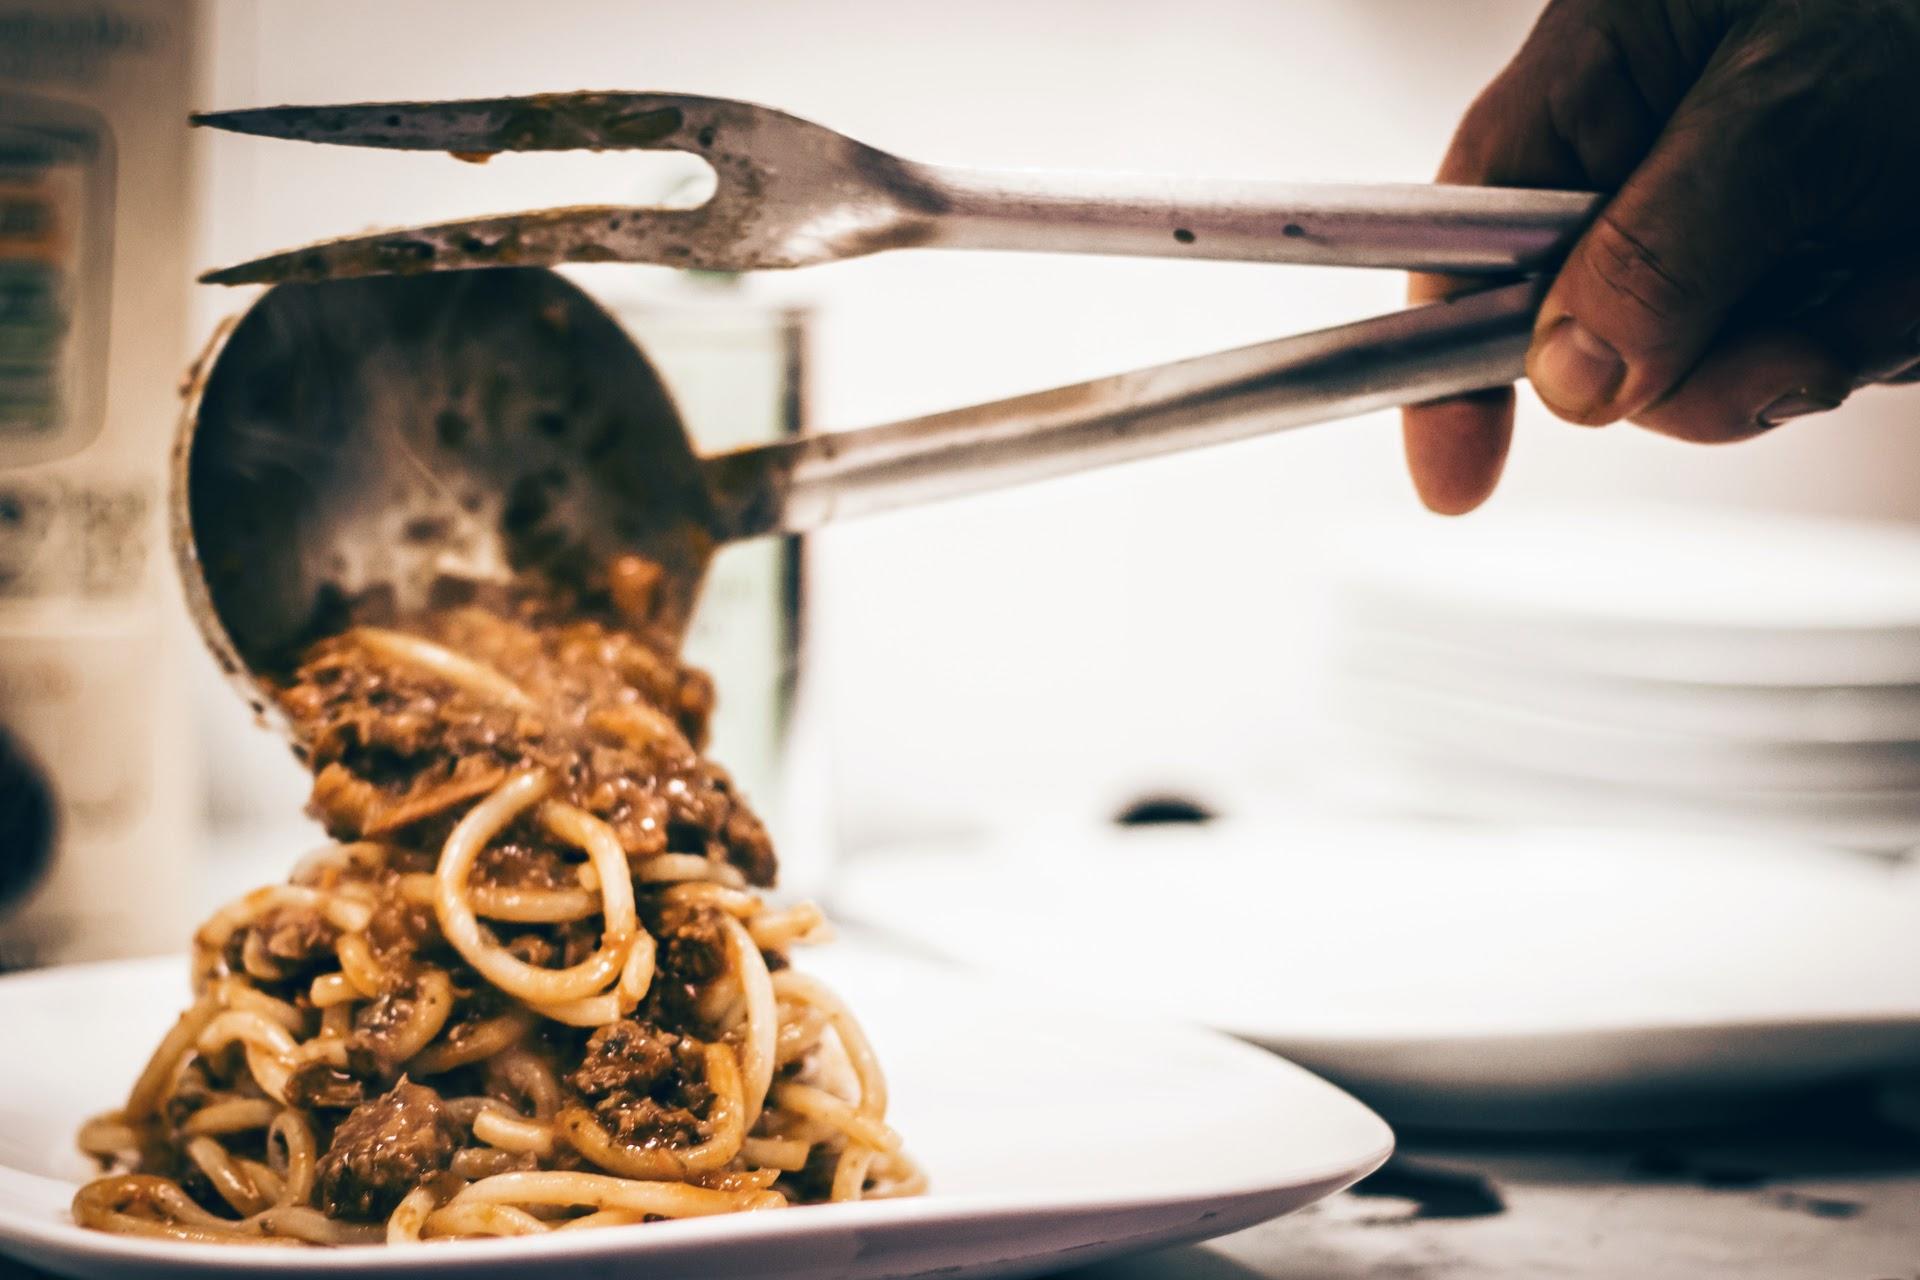 Florence: Tuscan gastronomia at Zeb